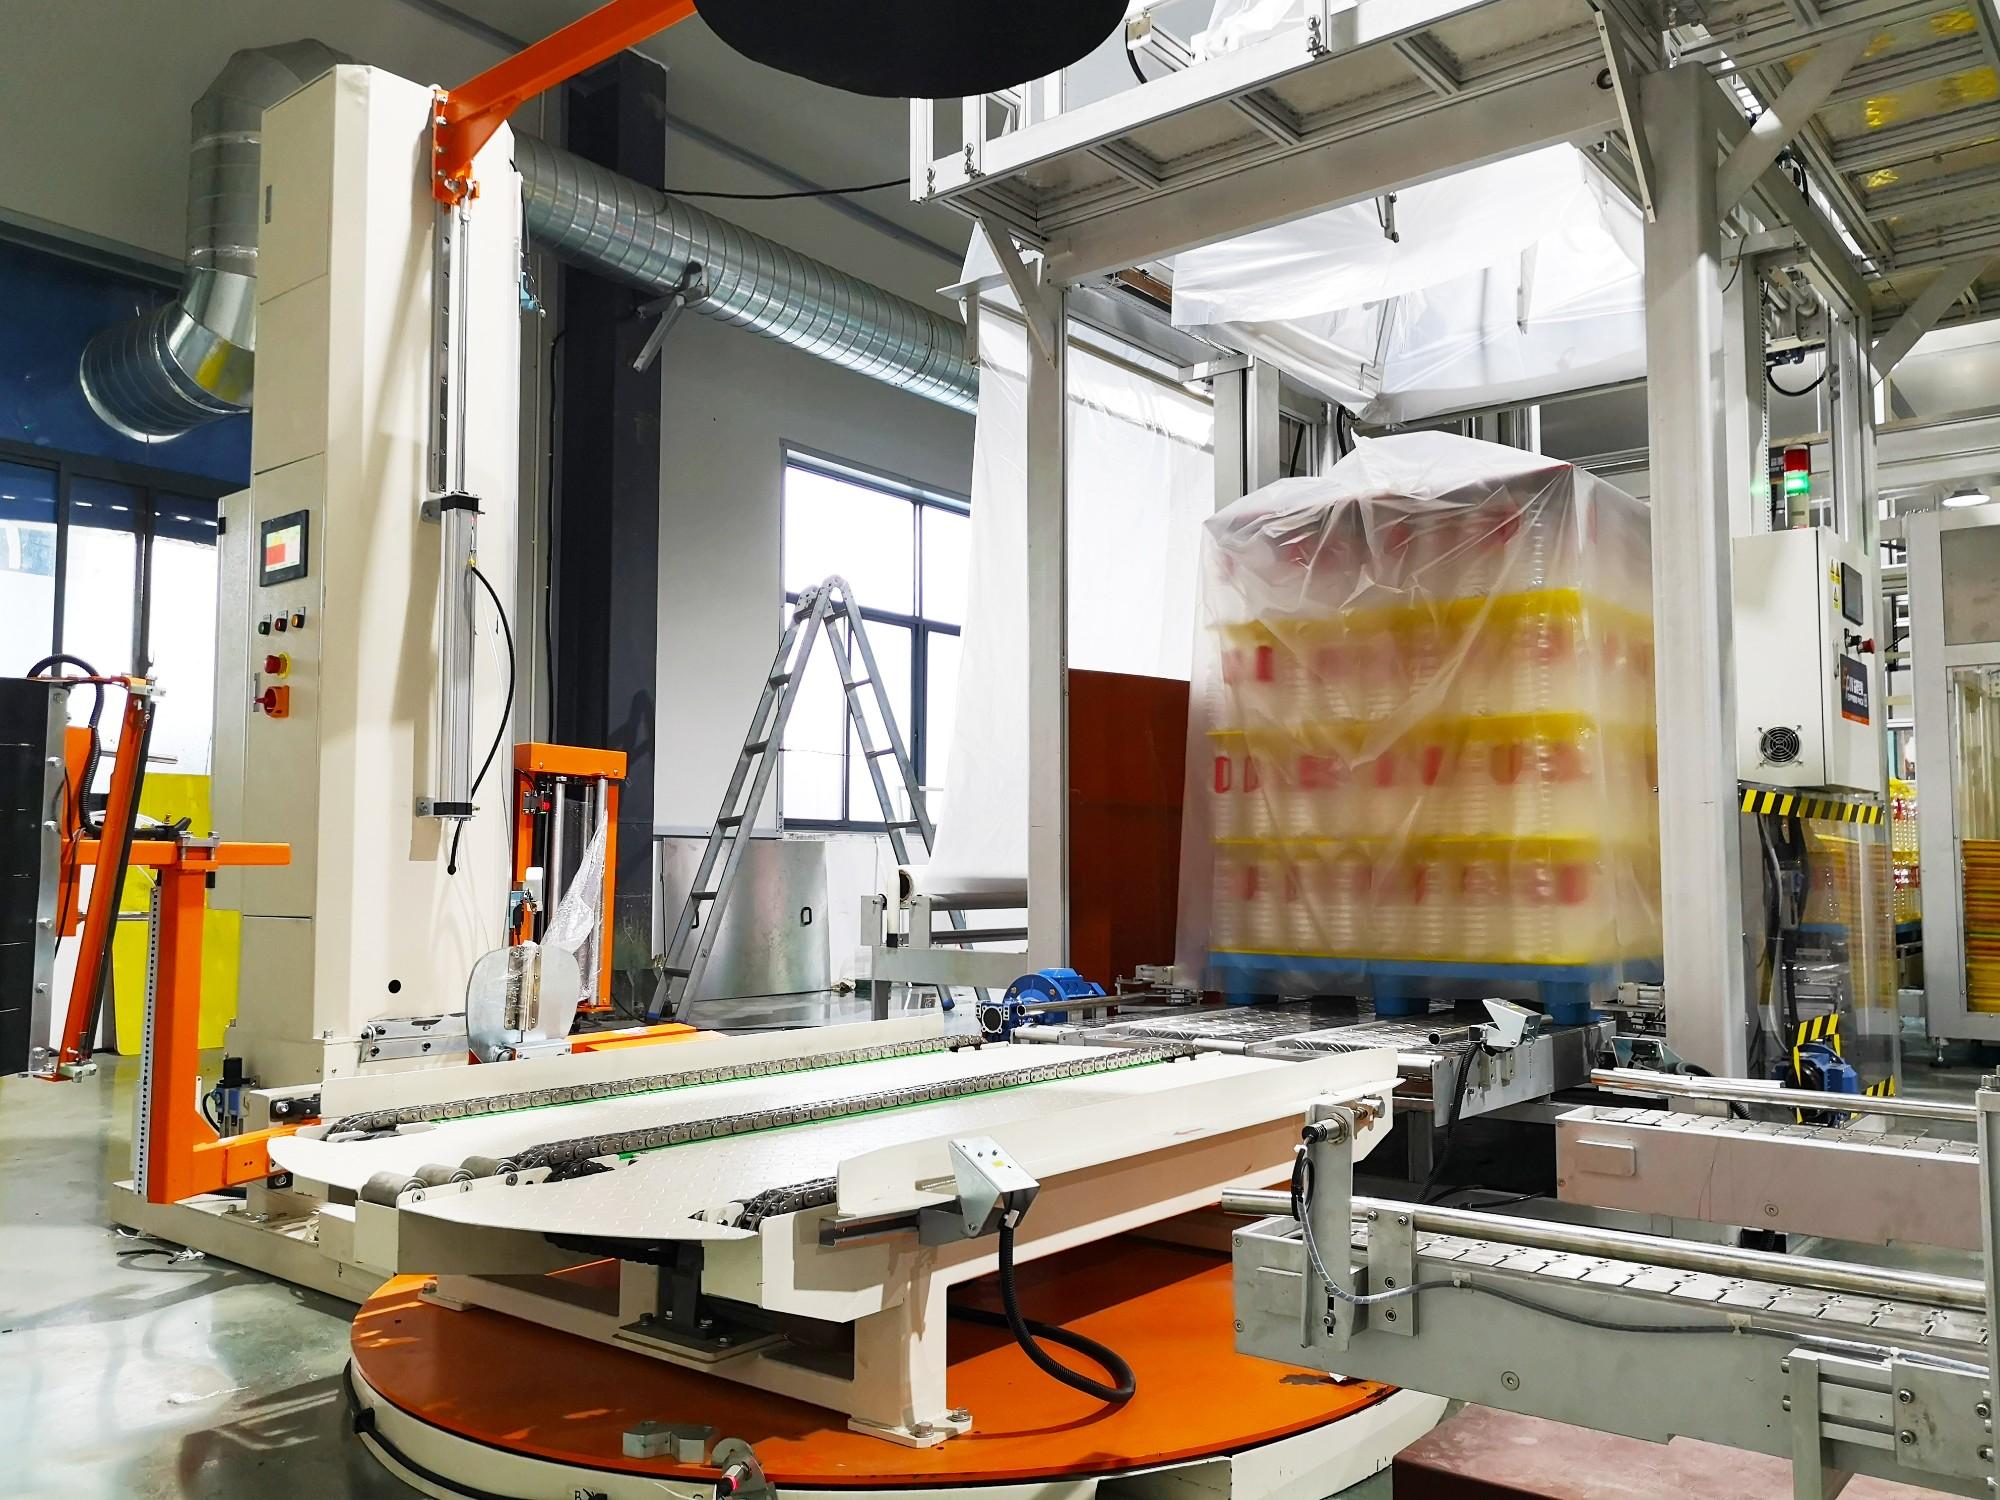 Pallet Bagging Machine Manufacturers, Pallet Bagging Machine Factory, Supply Pallet Bagging Machine